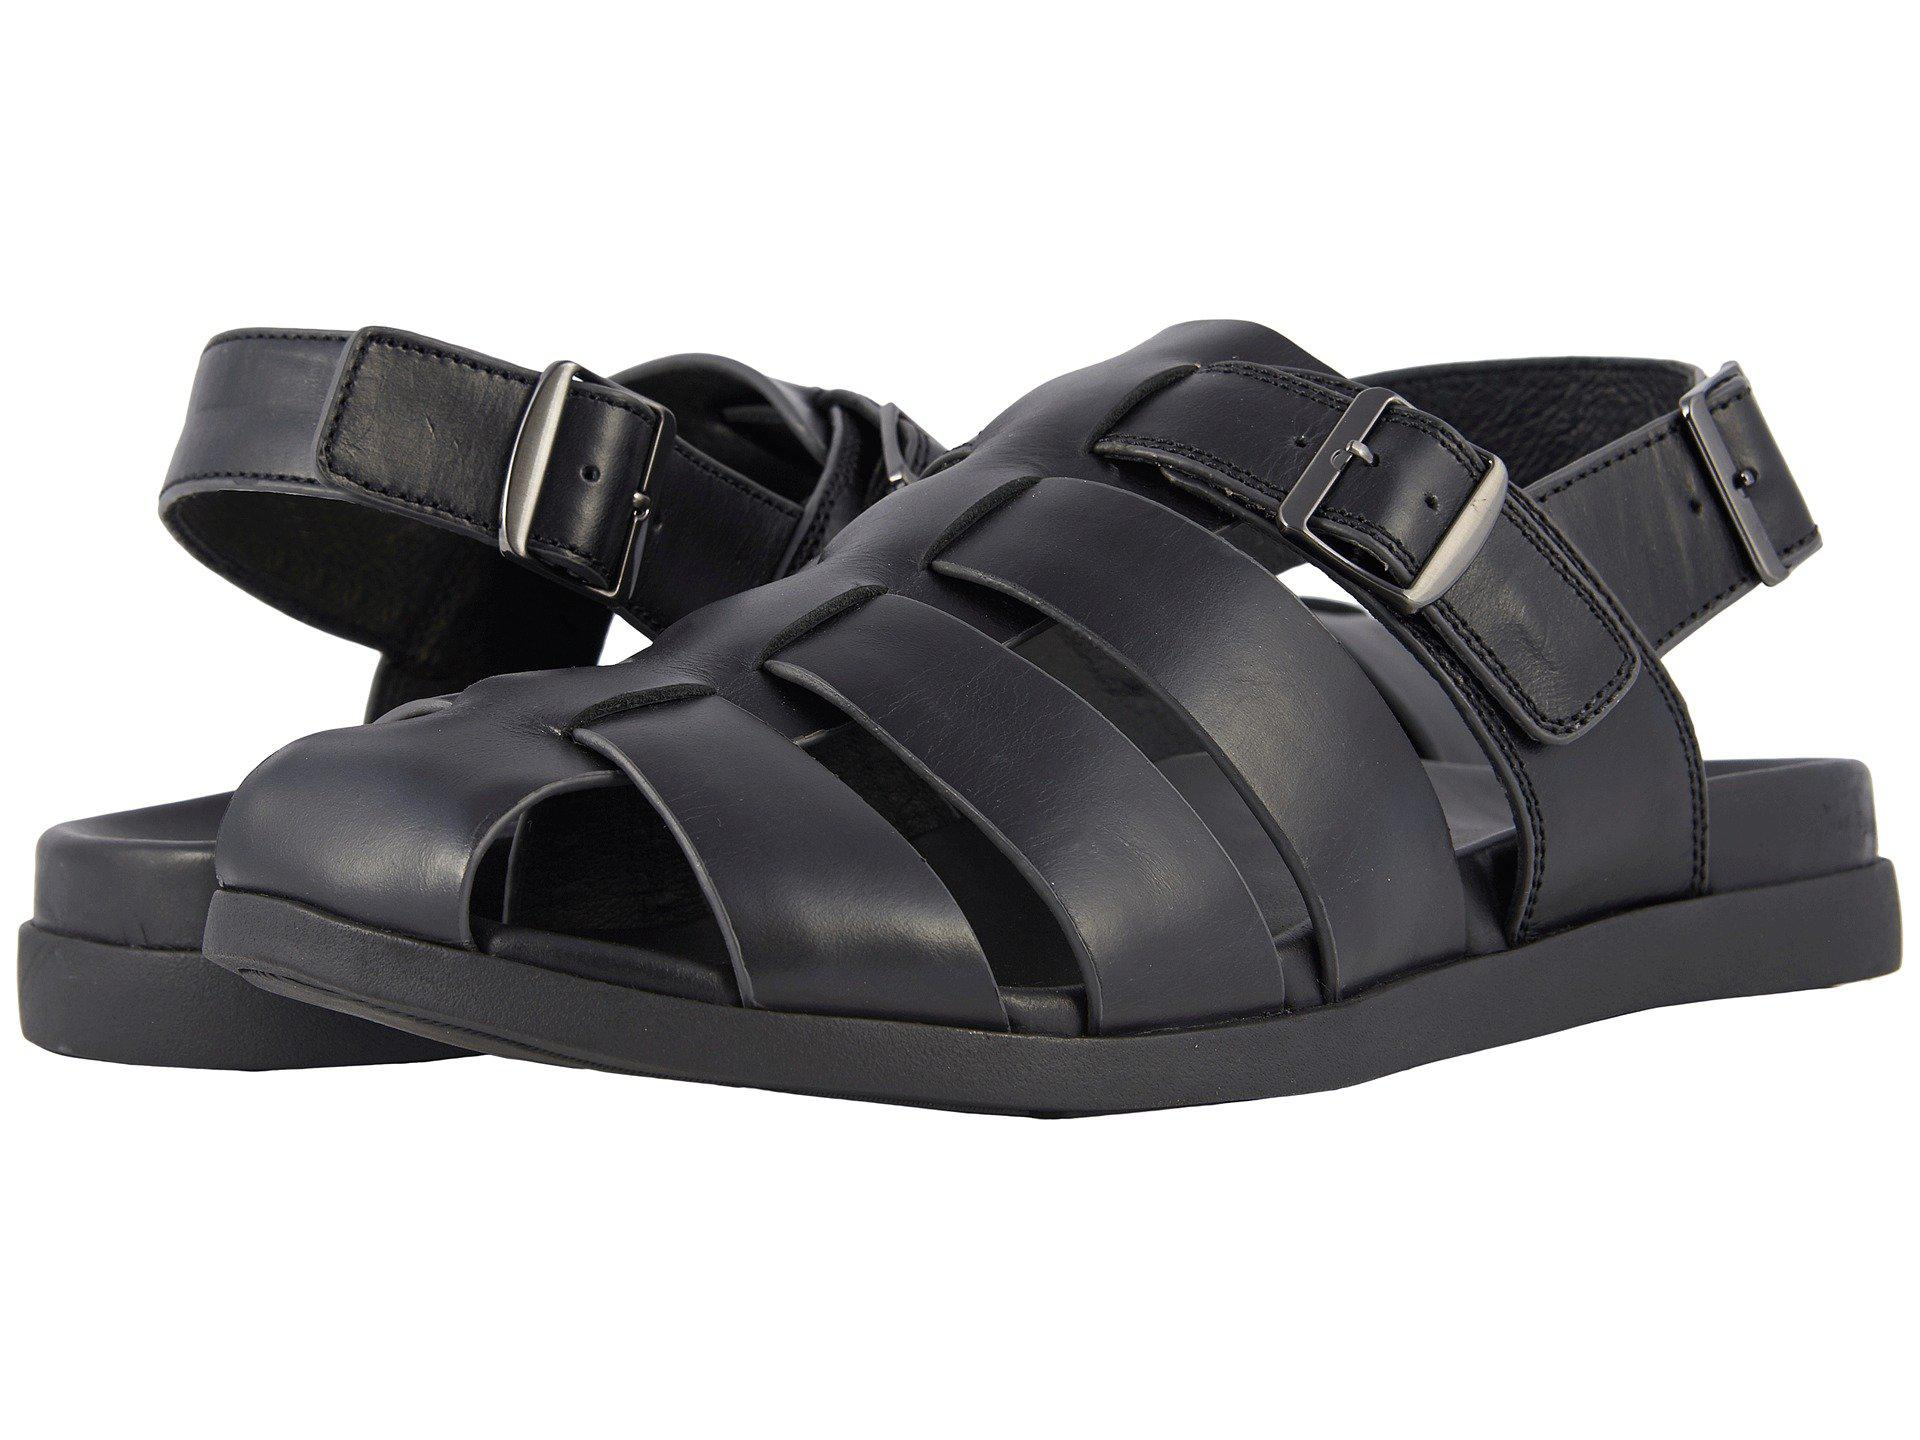 cd3c89d74be4 Lyst - Vionic Gil (black) Men s Sandals in Black for Men